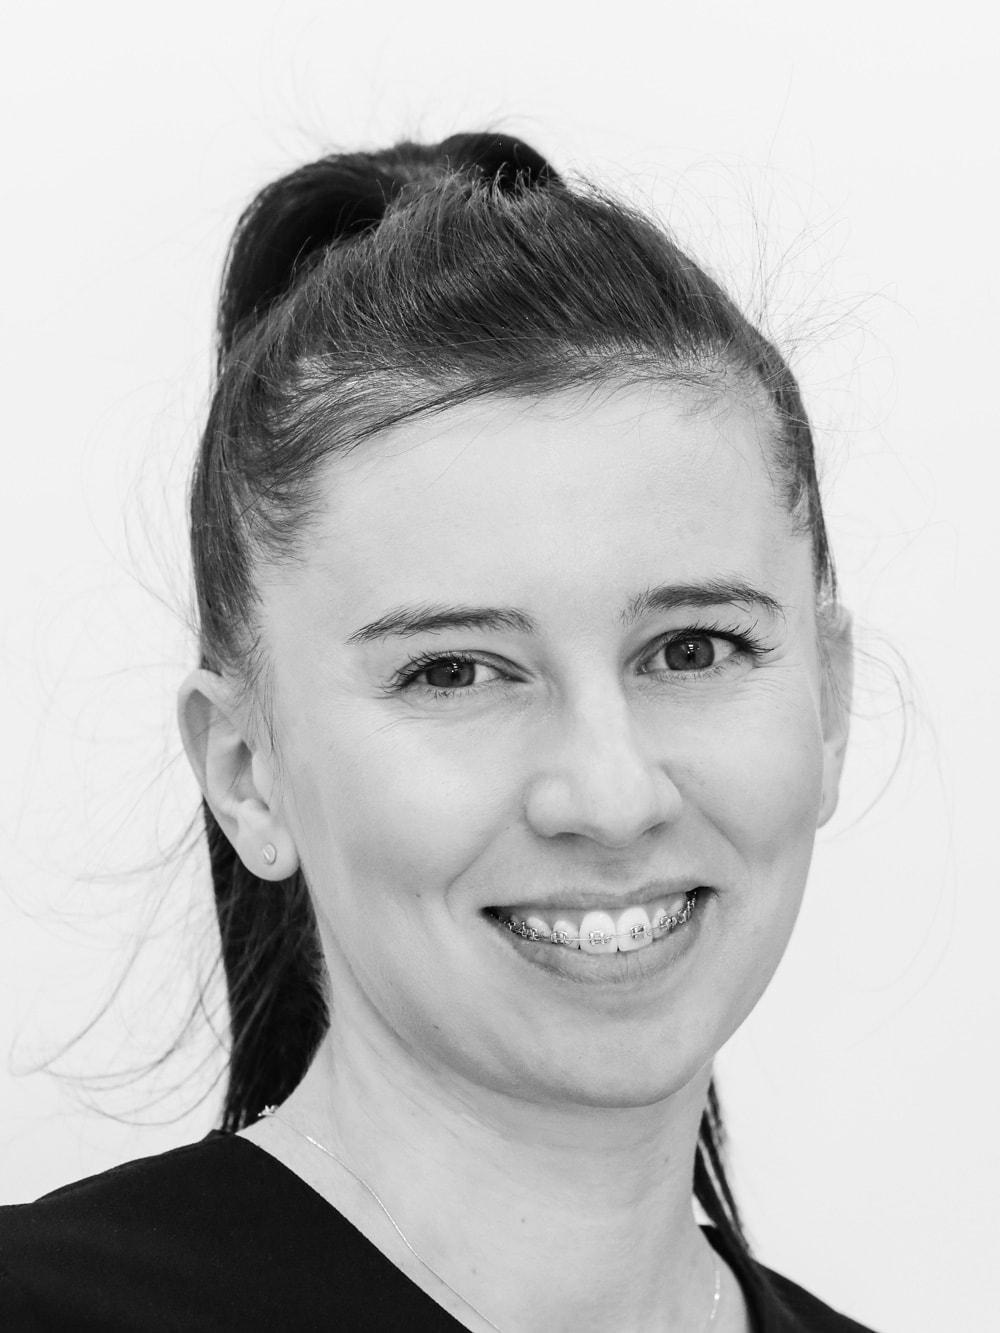 Joanna-Hopszta-Eurodent gabinet stomatologiczny Bielawa